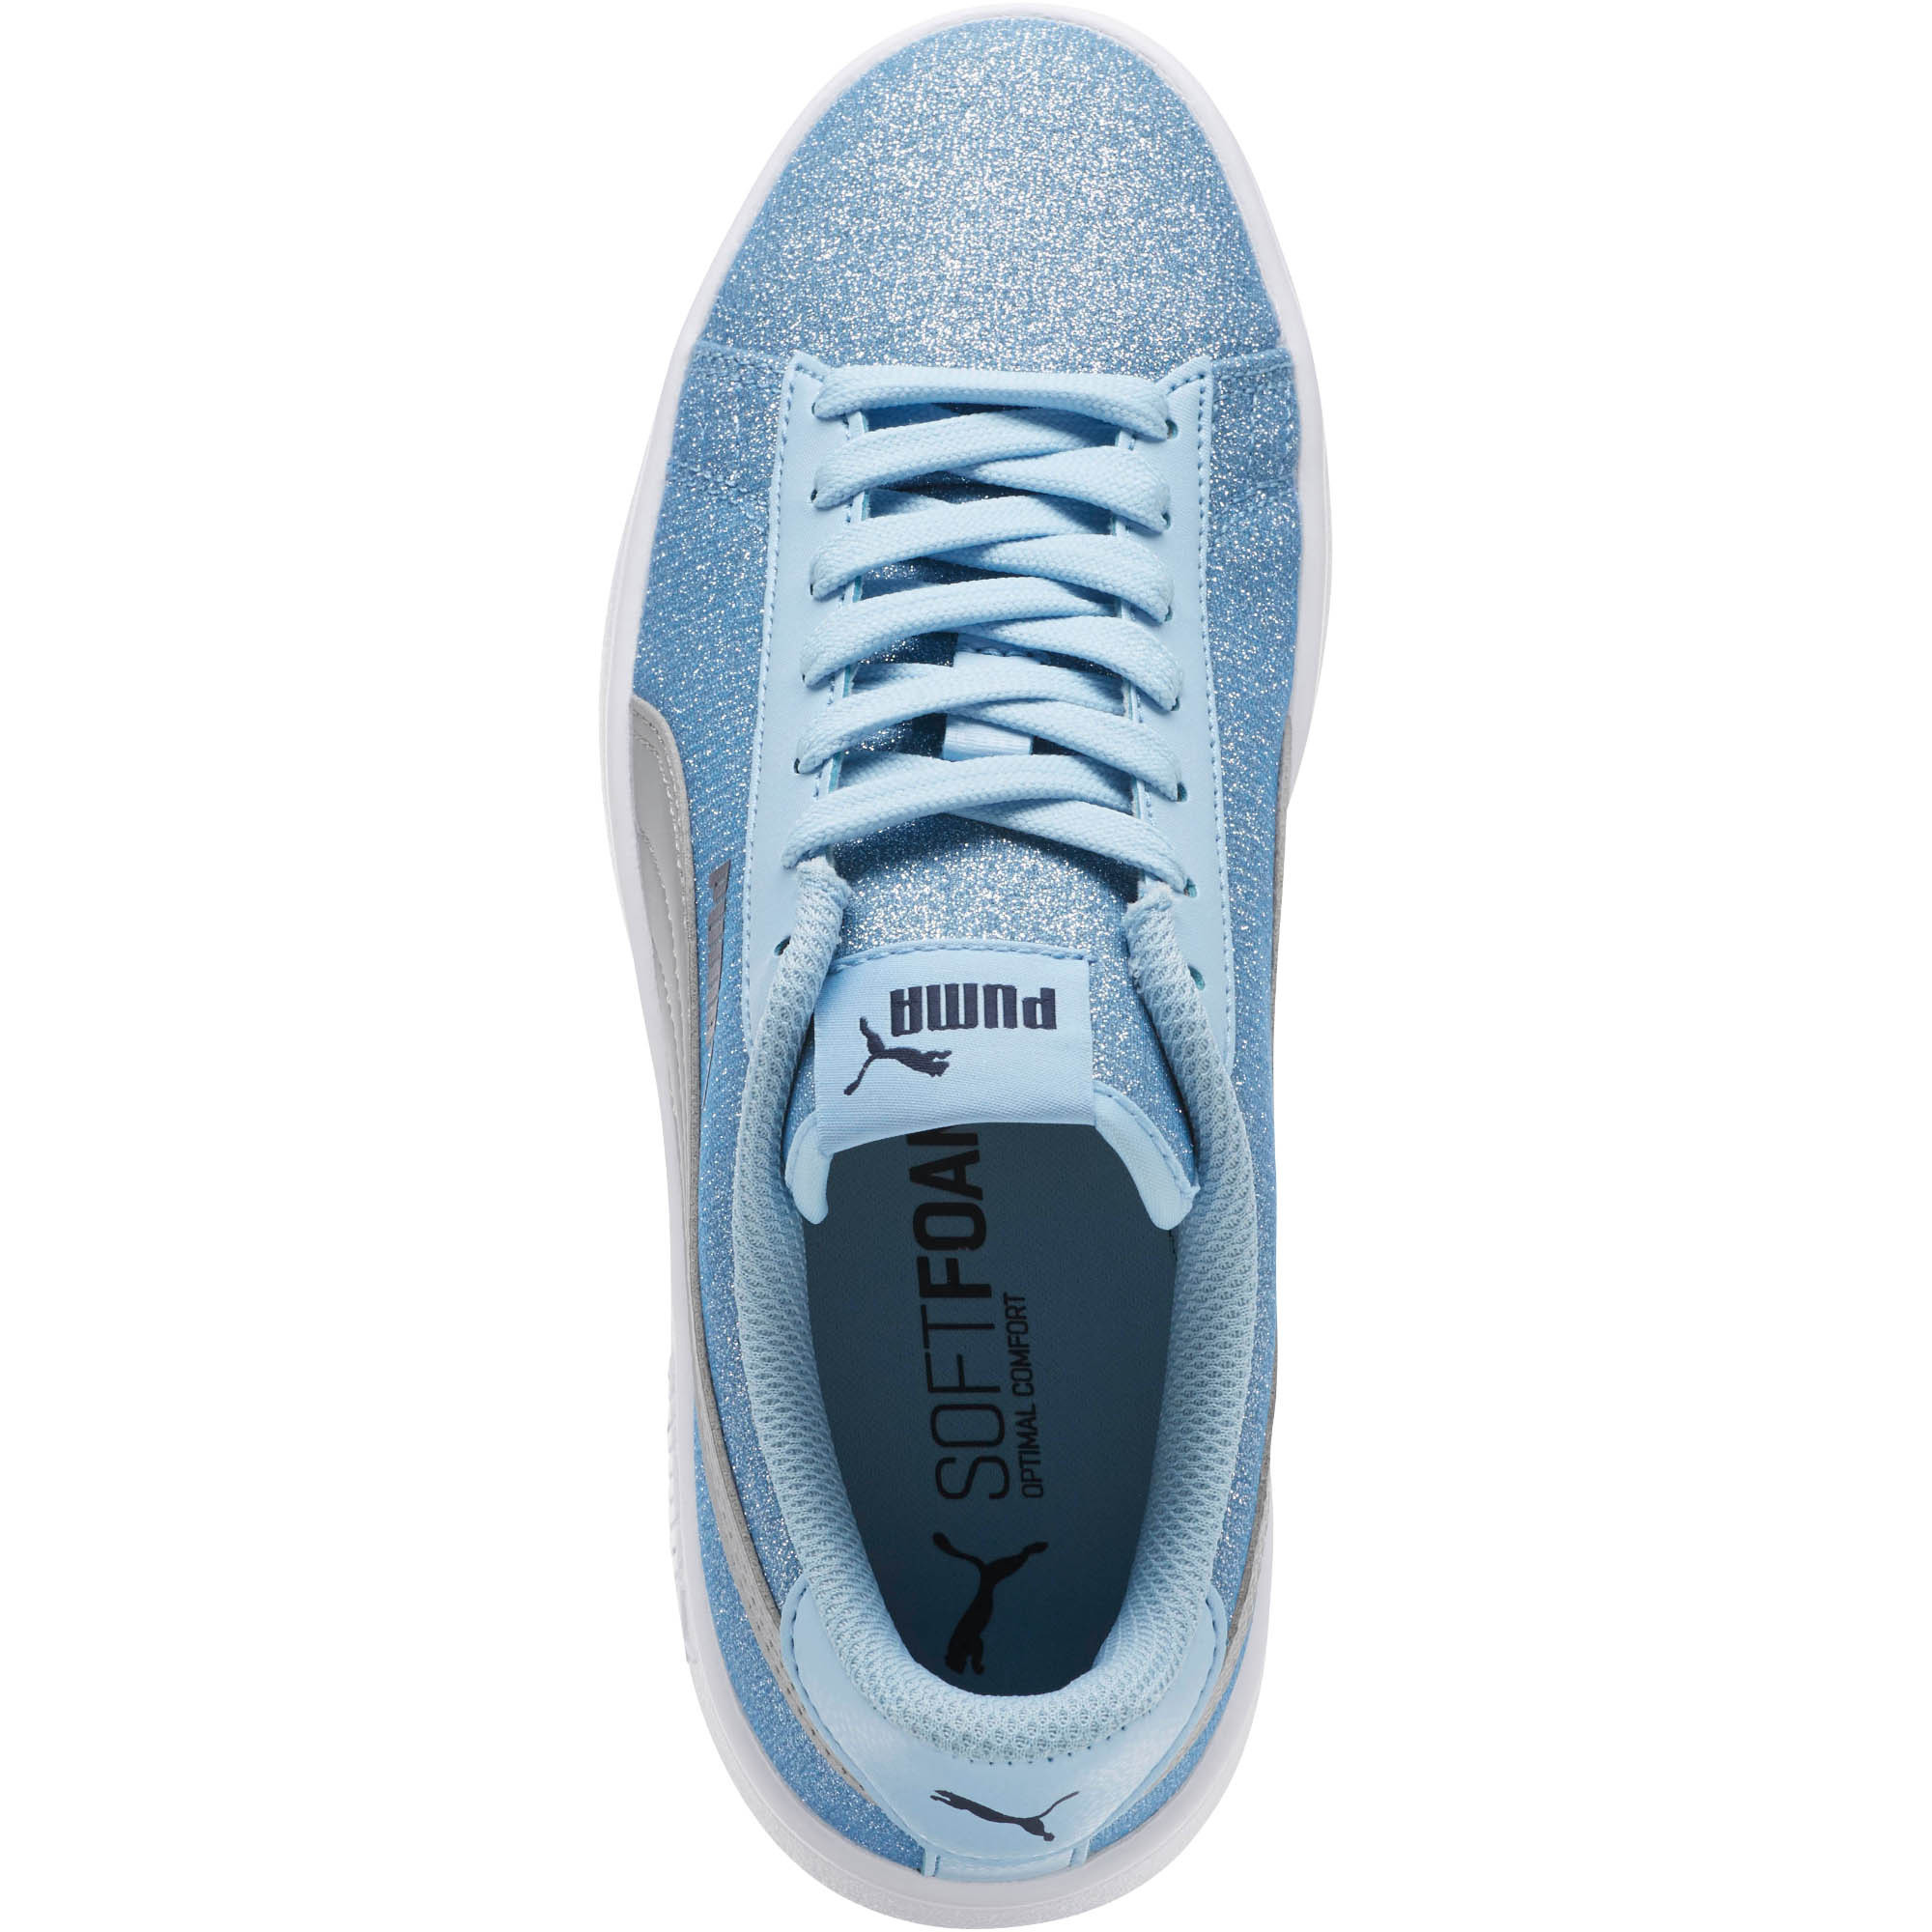 PUMA-Smash-v2-Glitz-Glam-Sneakers-JR-Girls-Shoe-Kids thumbnail 6